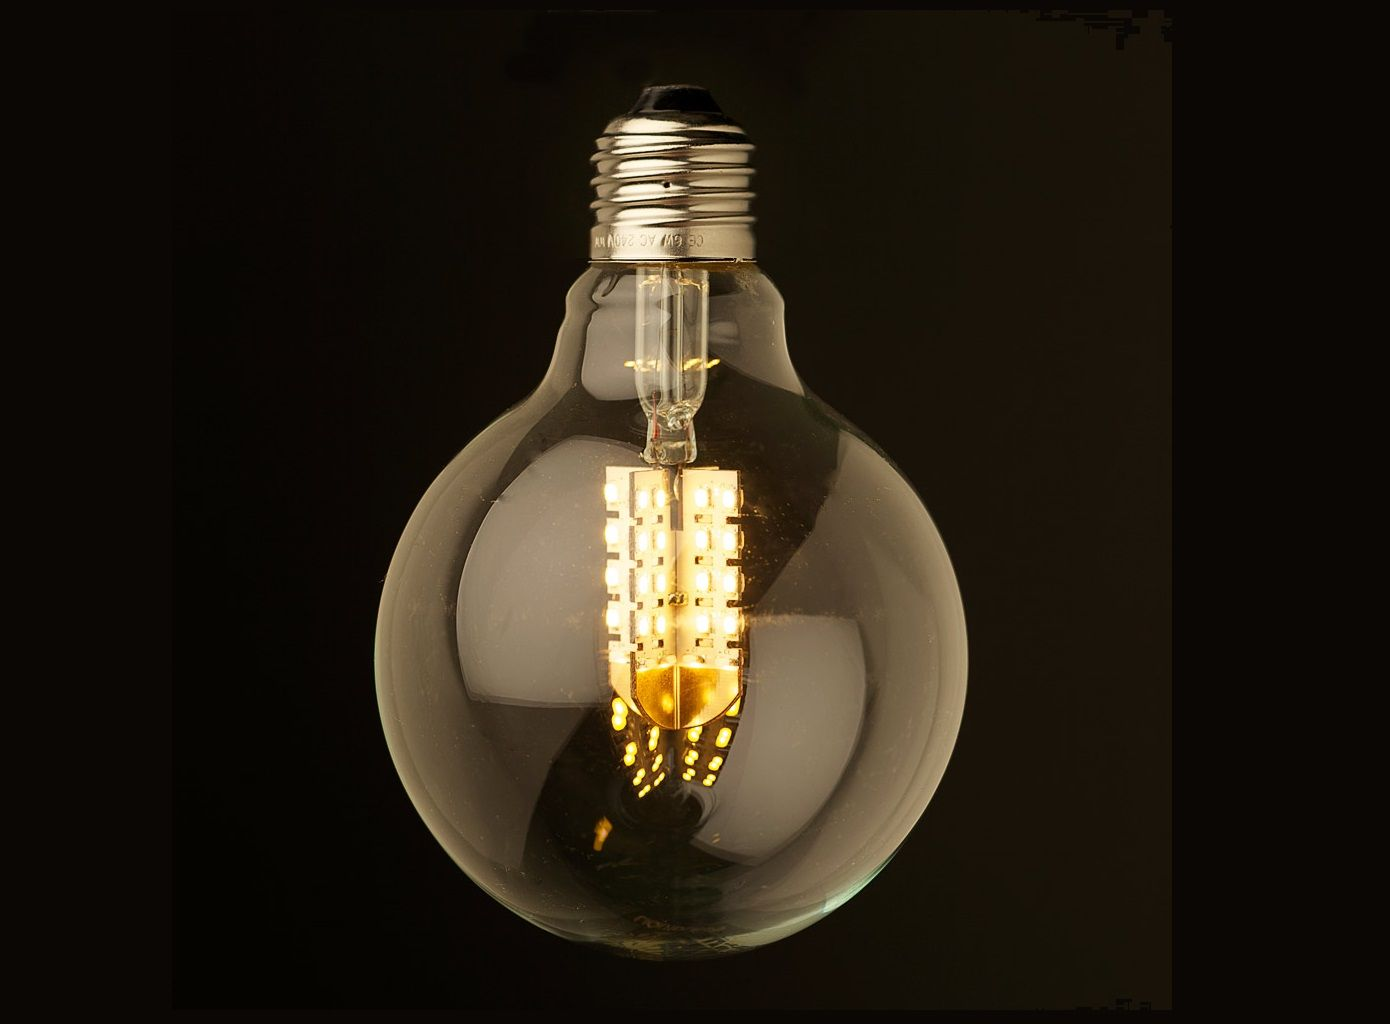 Led Globe 230 Volt 5 Watt 410 Lumen Vv 40 Watt Warm Wit E27 Dimbaar Kogel Lamplicht Lampvoeten Light Bulb